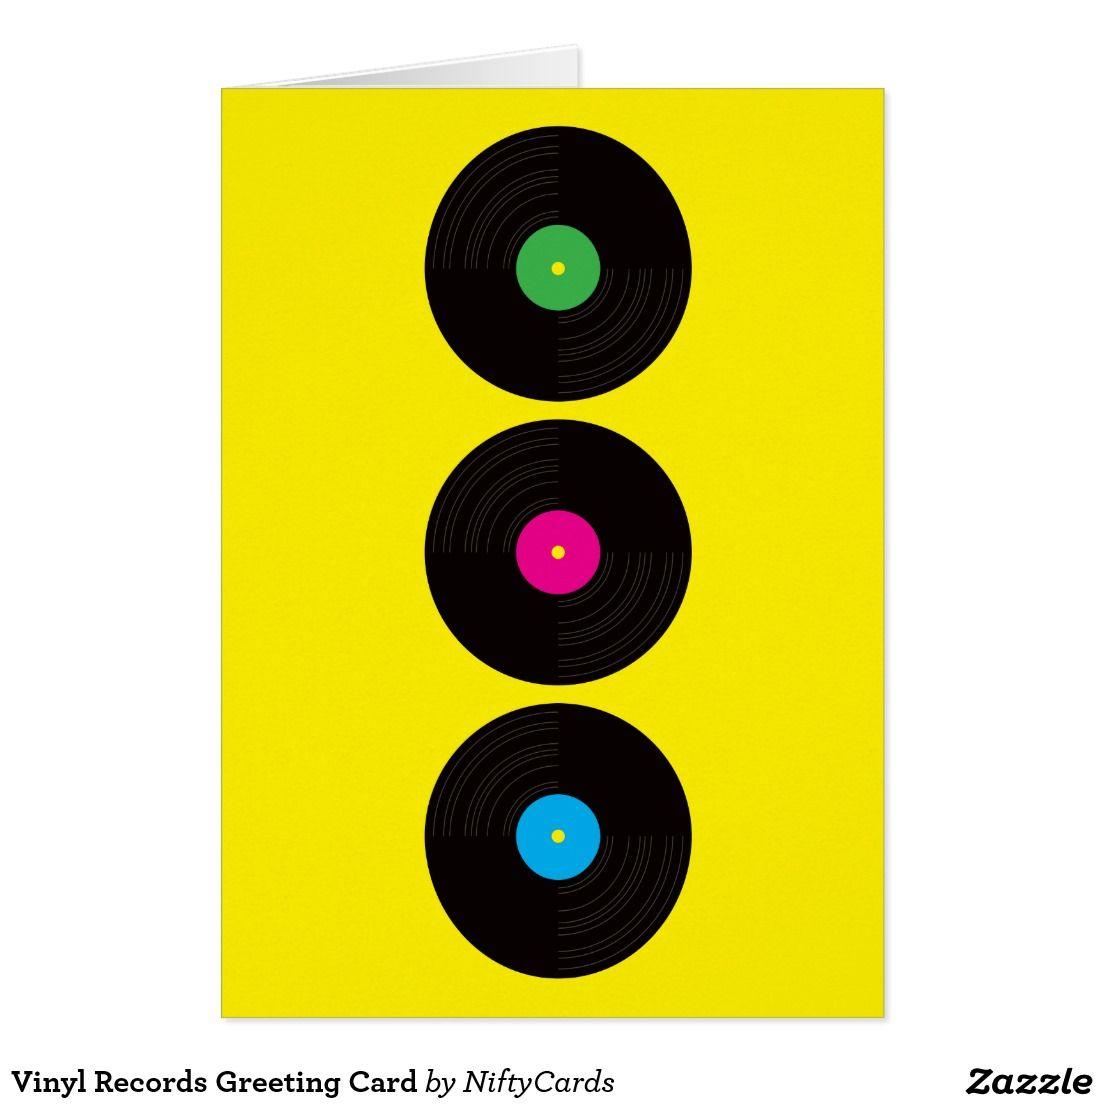 Vinyl Records Greeting Card Zazzle Co Uk Vinyl Records Greeting Cards Vinyl